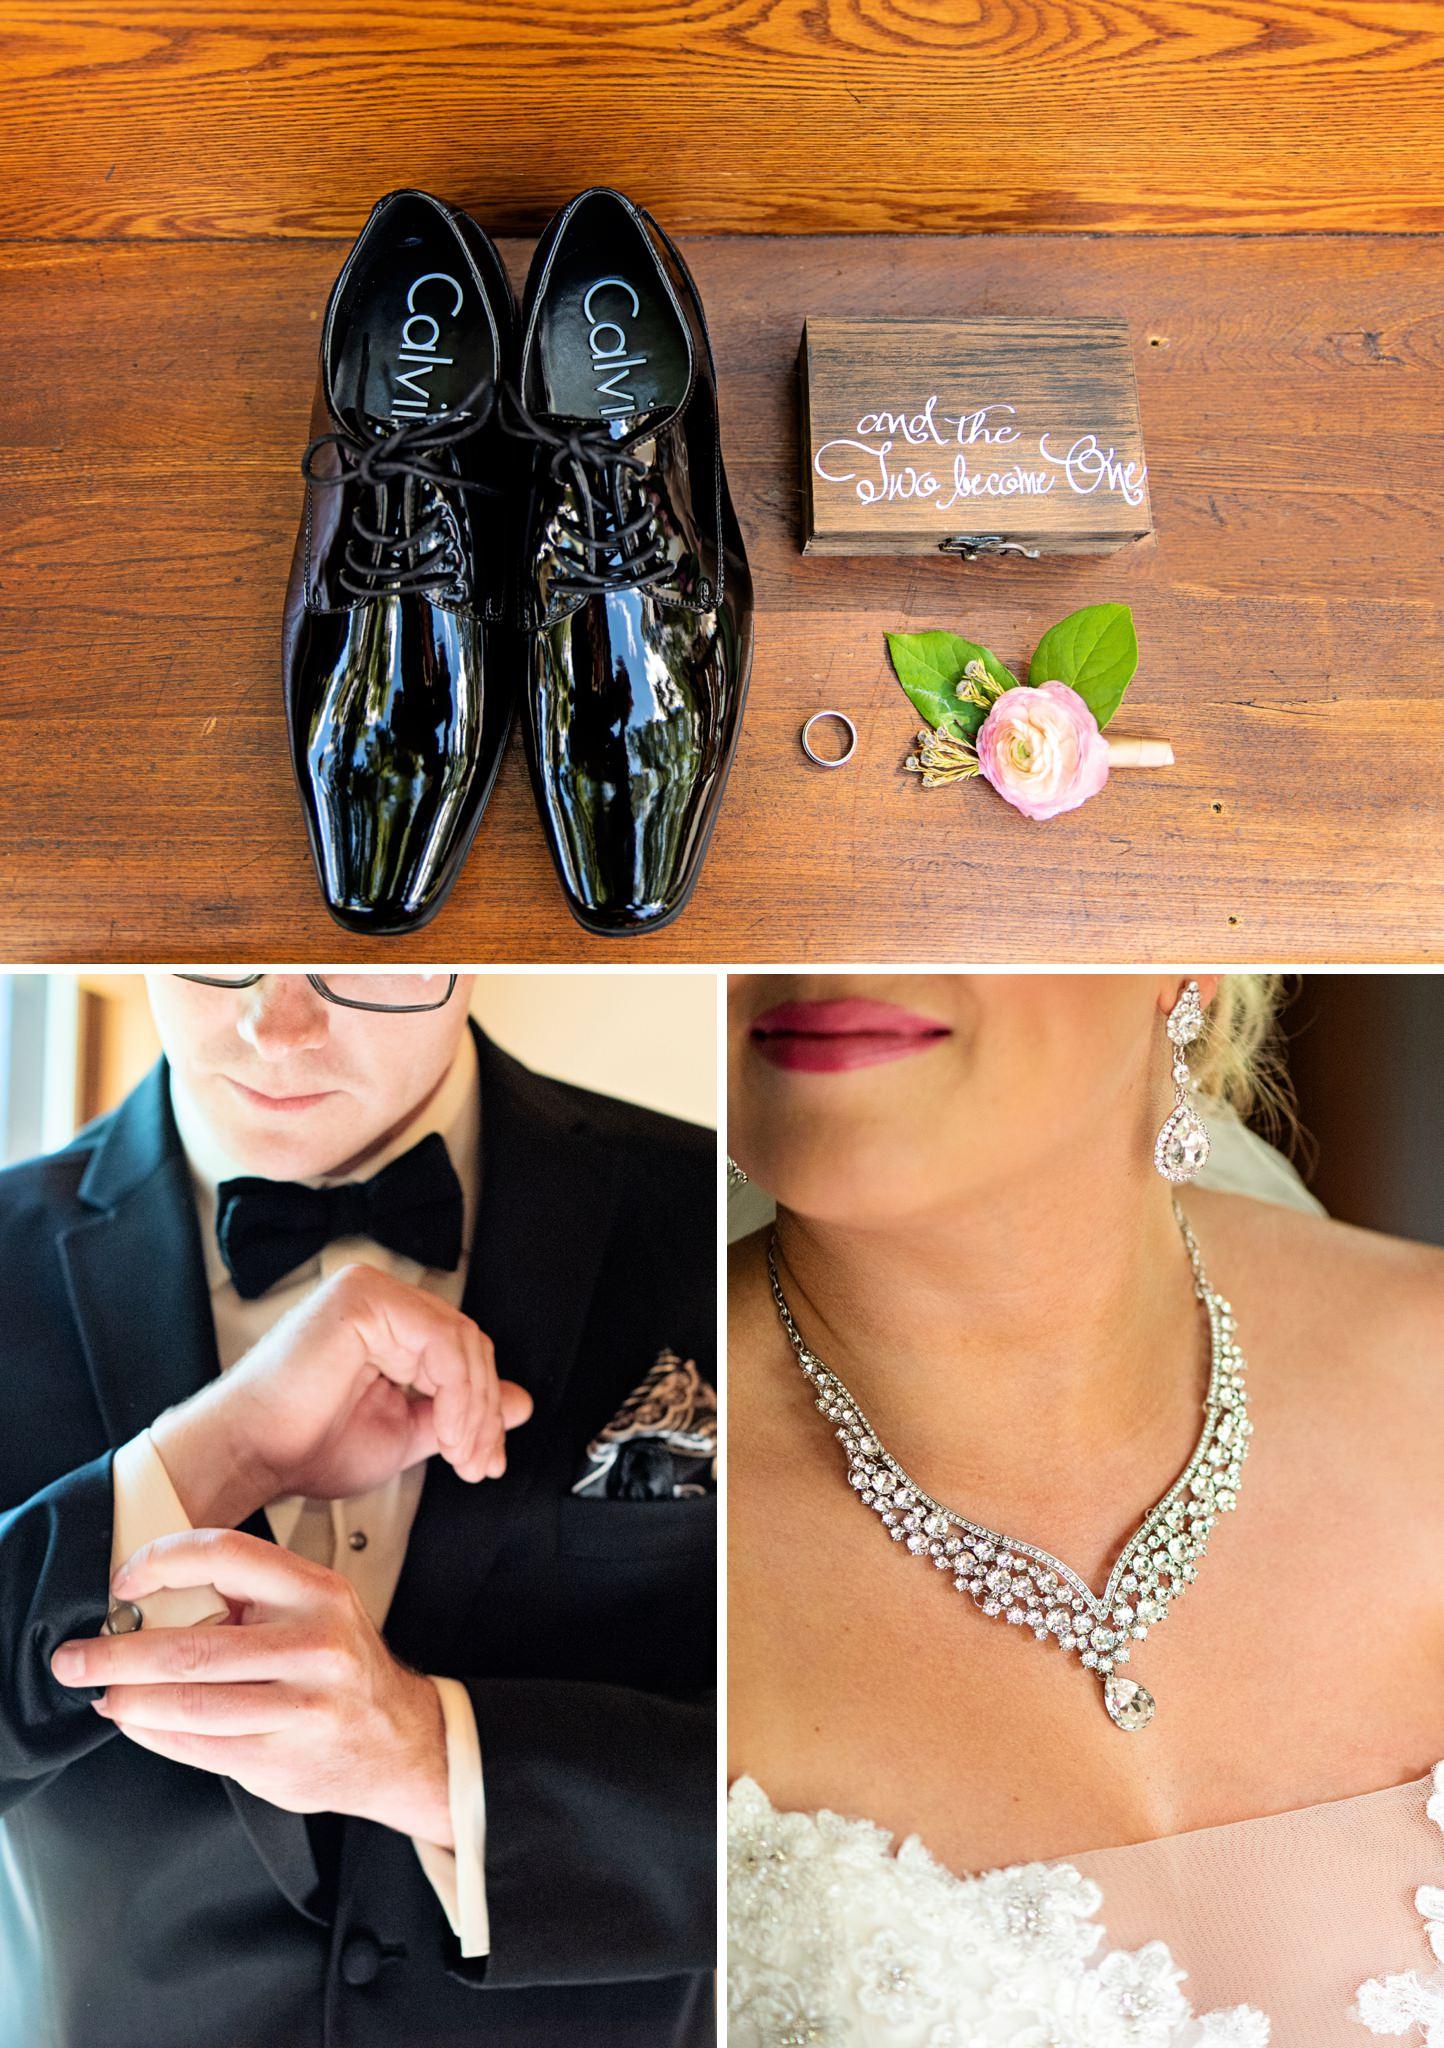 Brittany-Jay-Wedding-091518-Rotella-Photography-3_BLOG.jpg